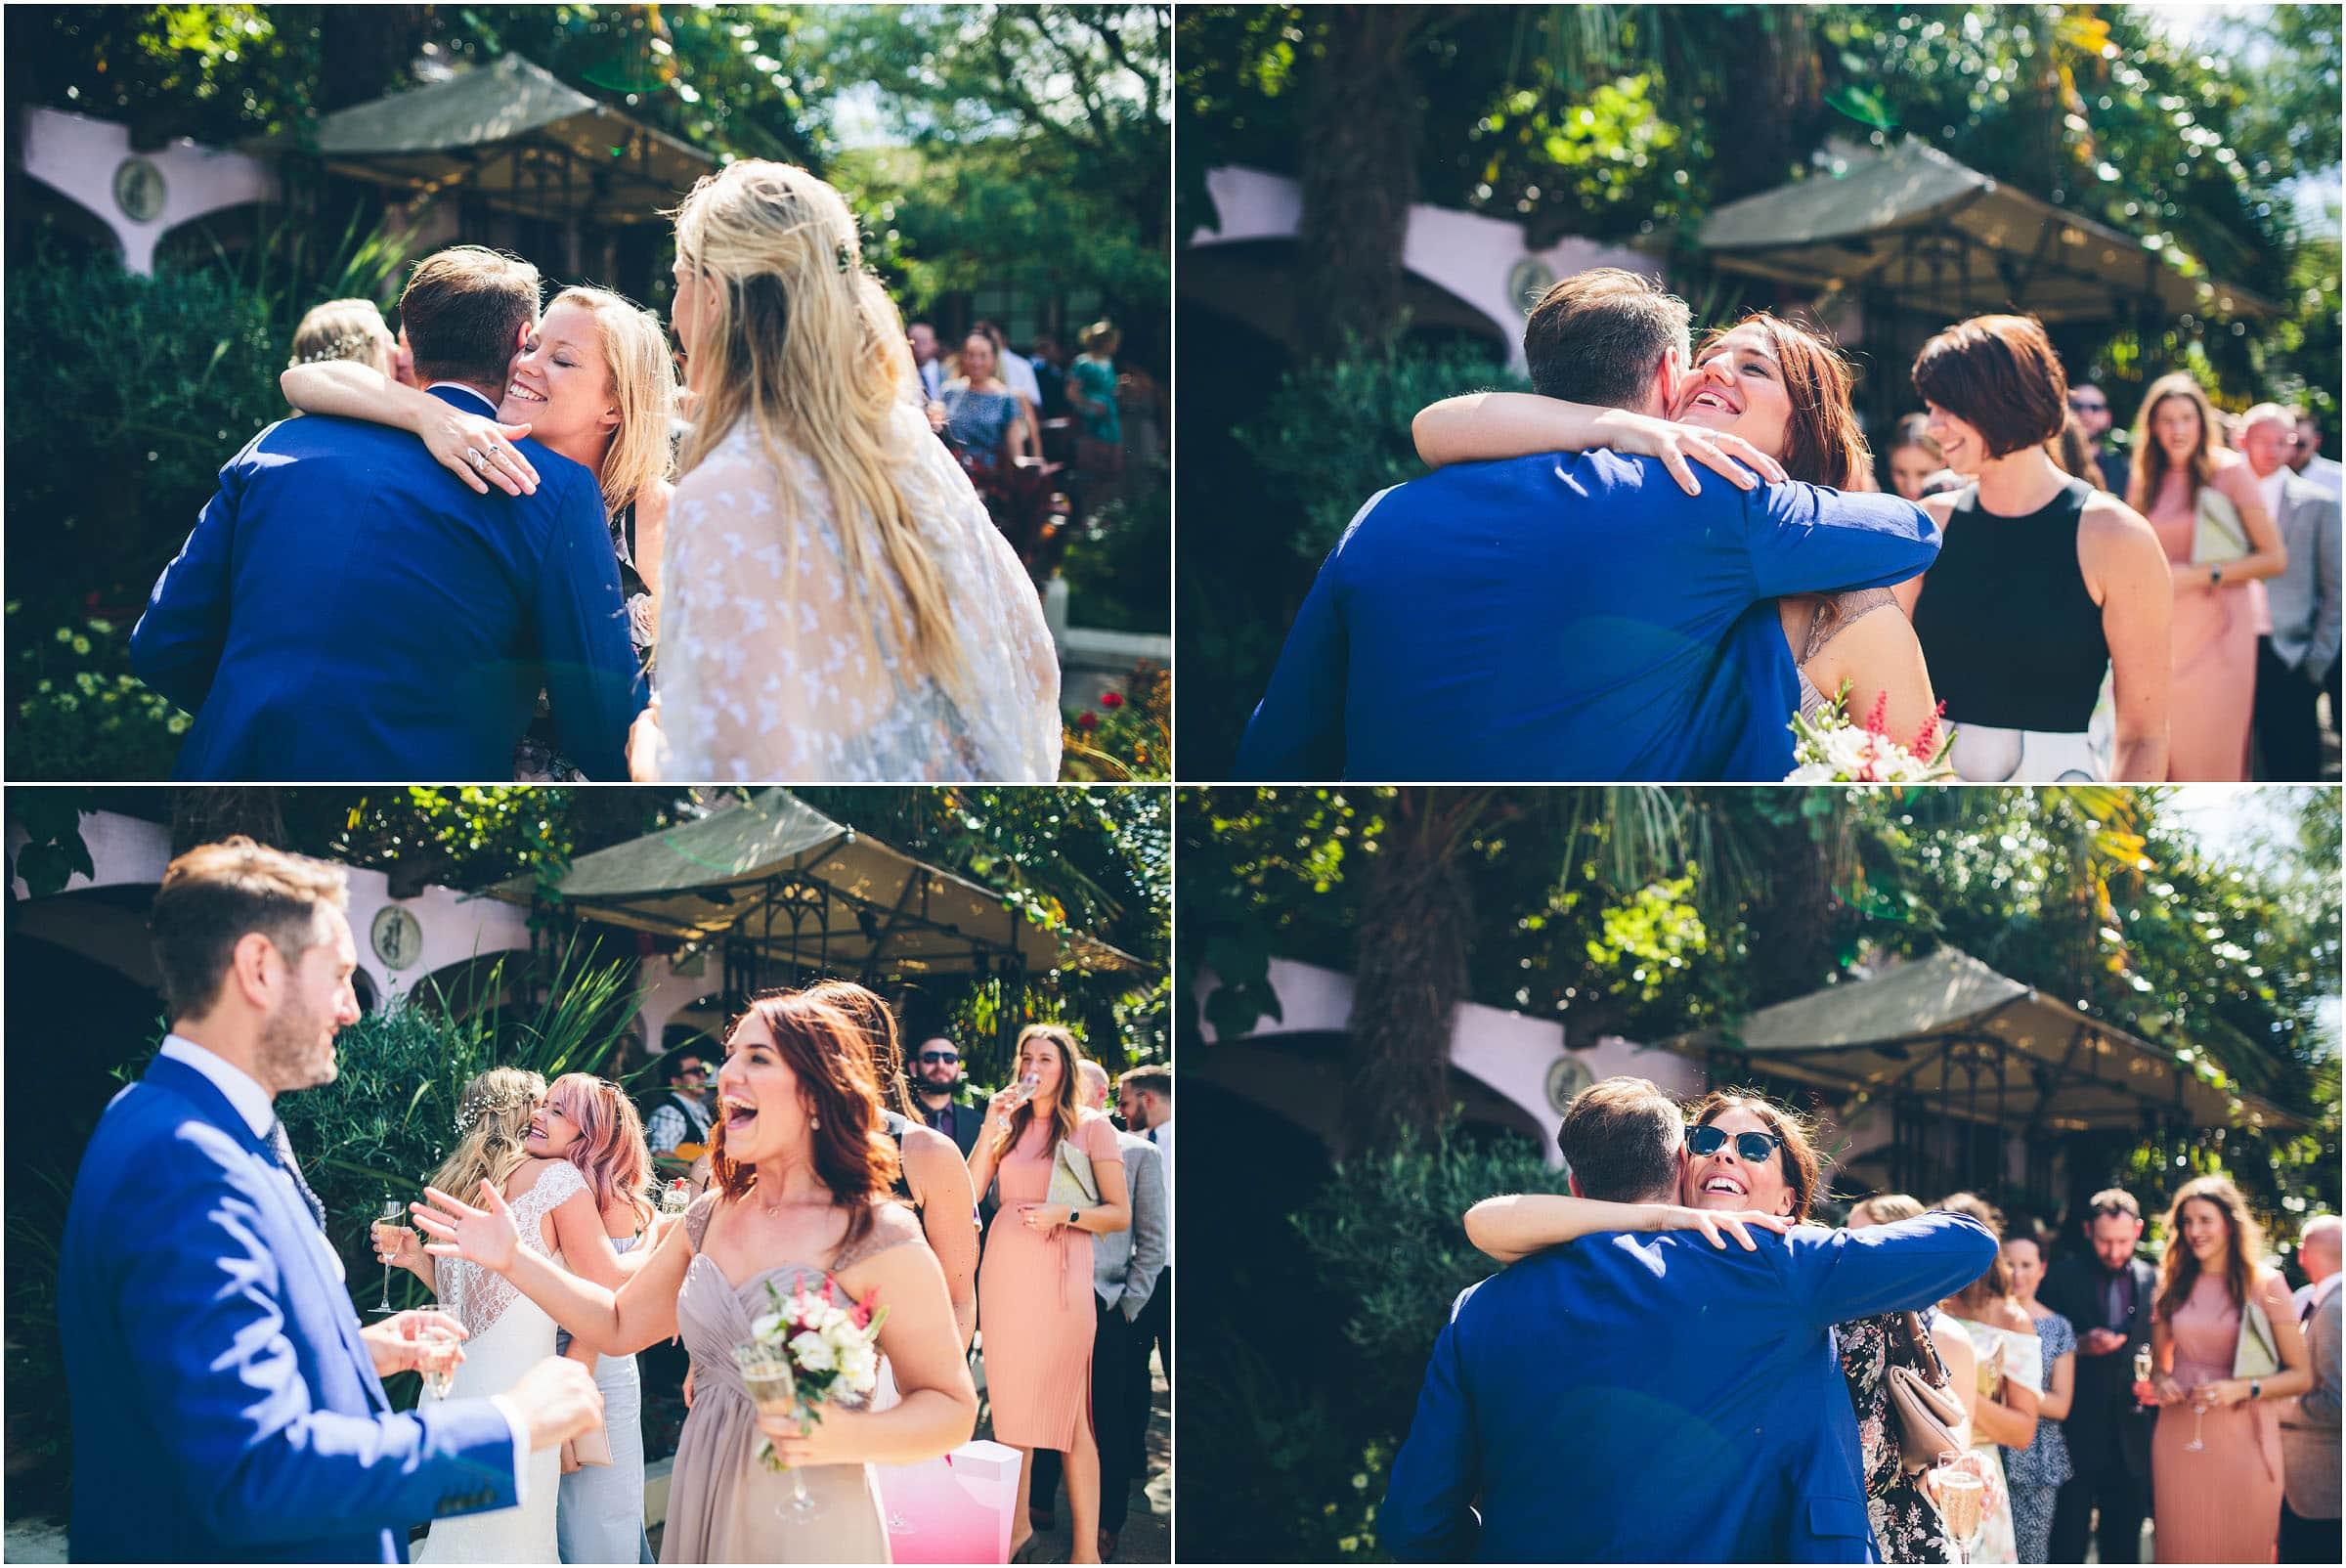 Kensington_Roof_Gardens_Wedding_Photography_0045